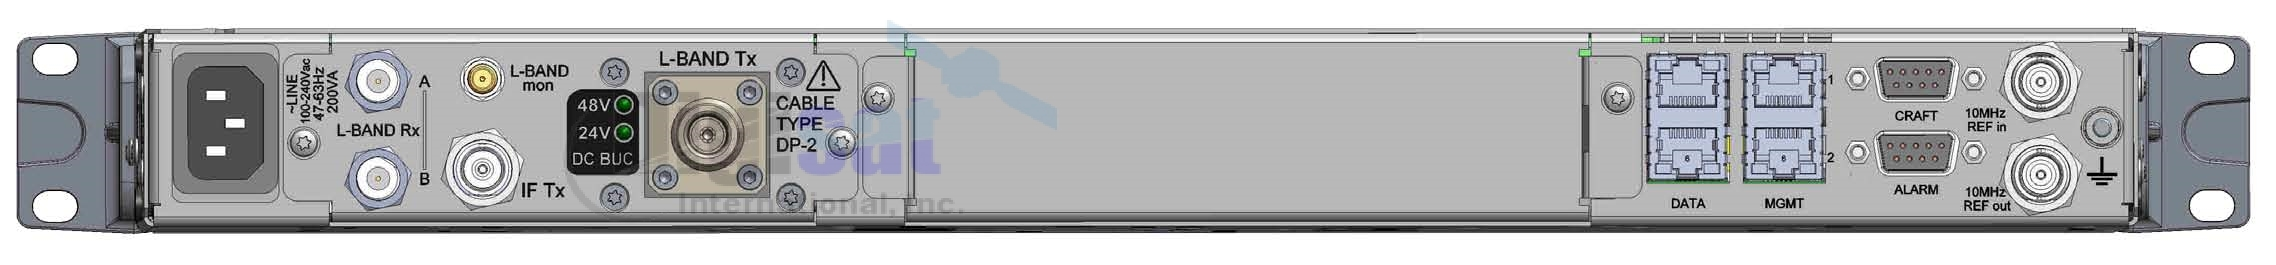 Newtec MDM9000 Rear RF Interface